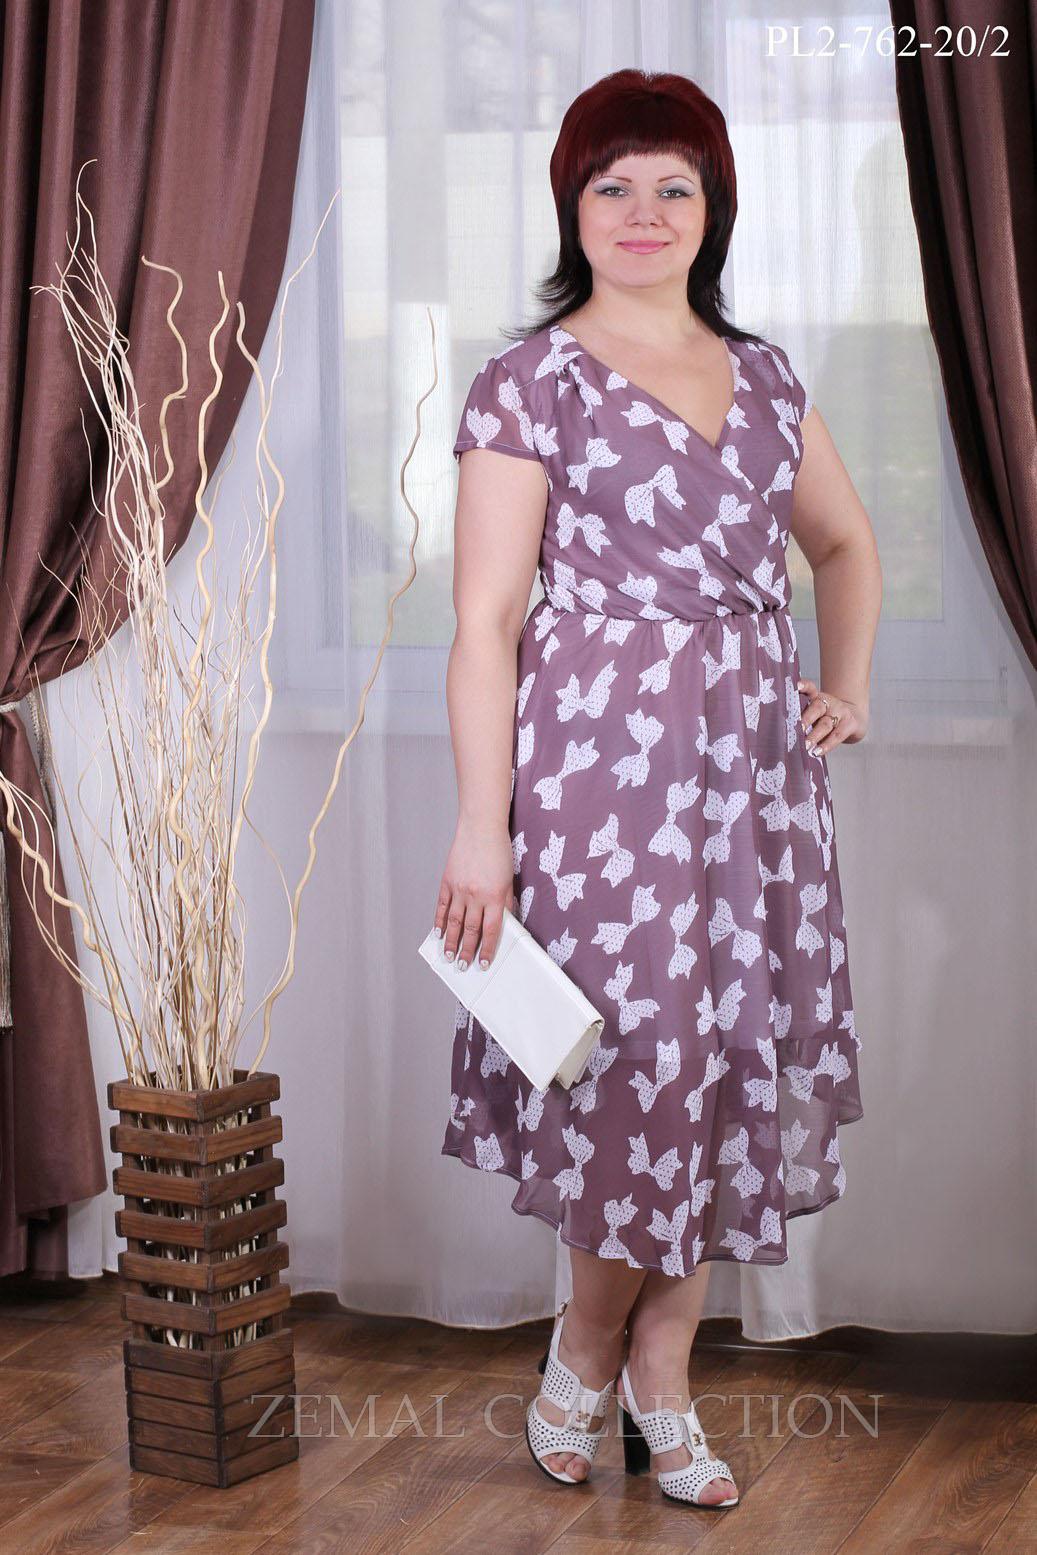 Сукня pl2-762 купить на сайте производителя